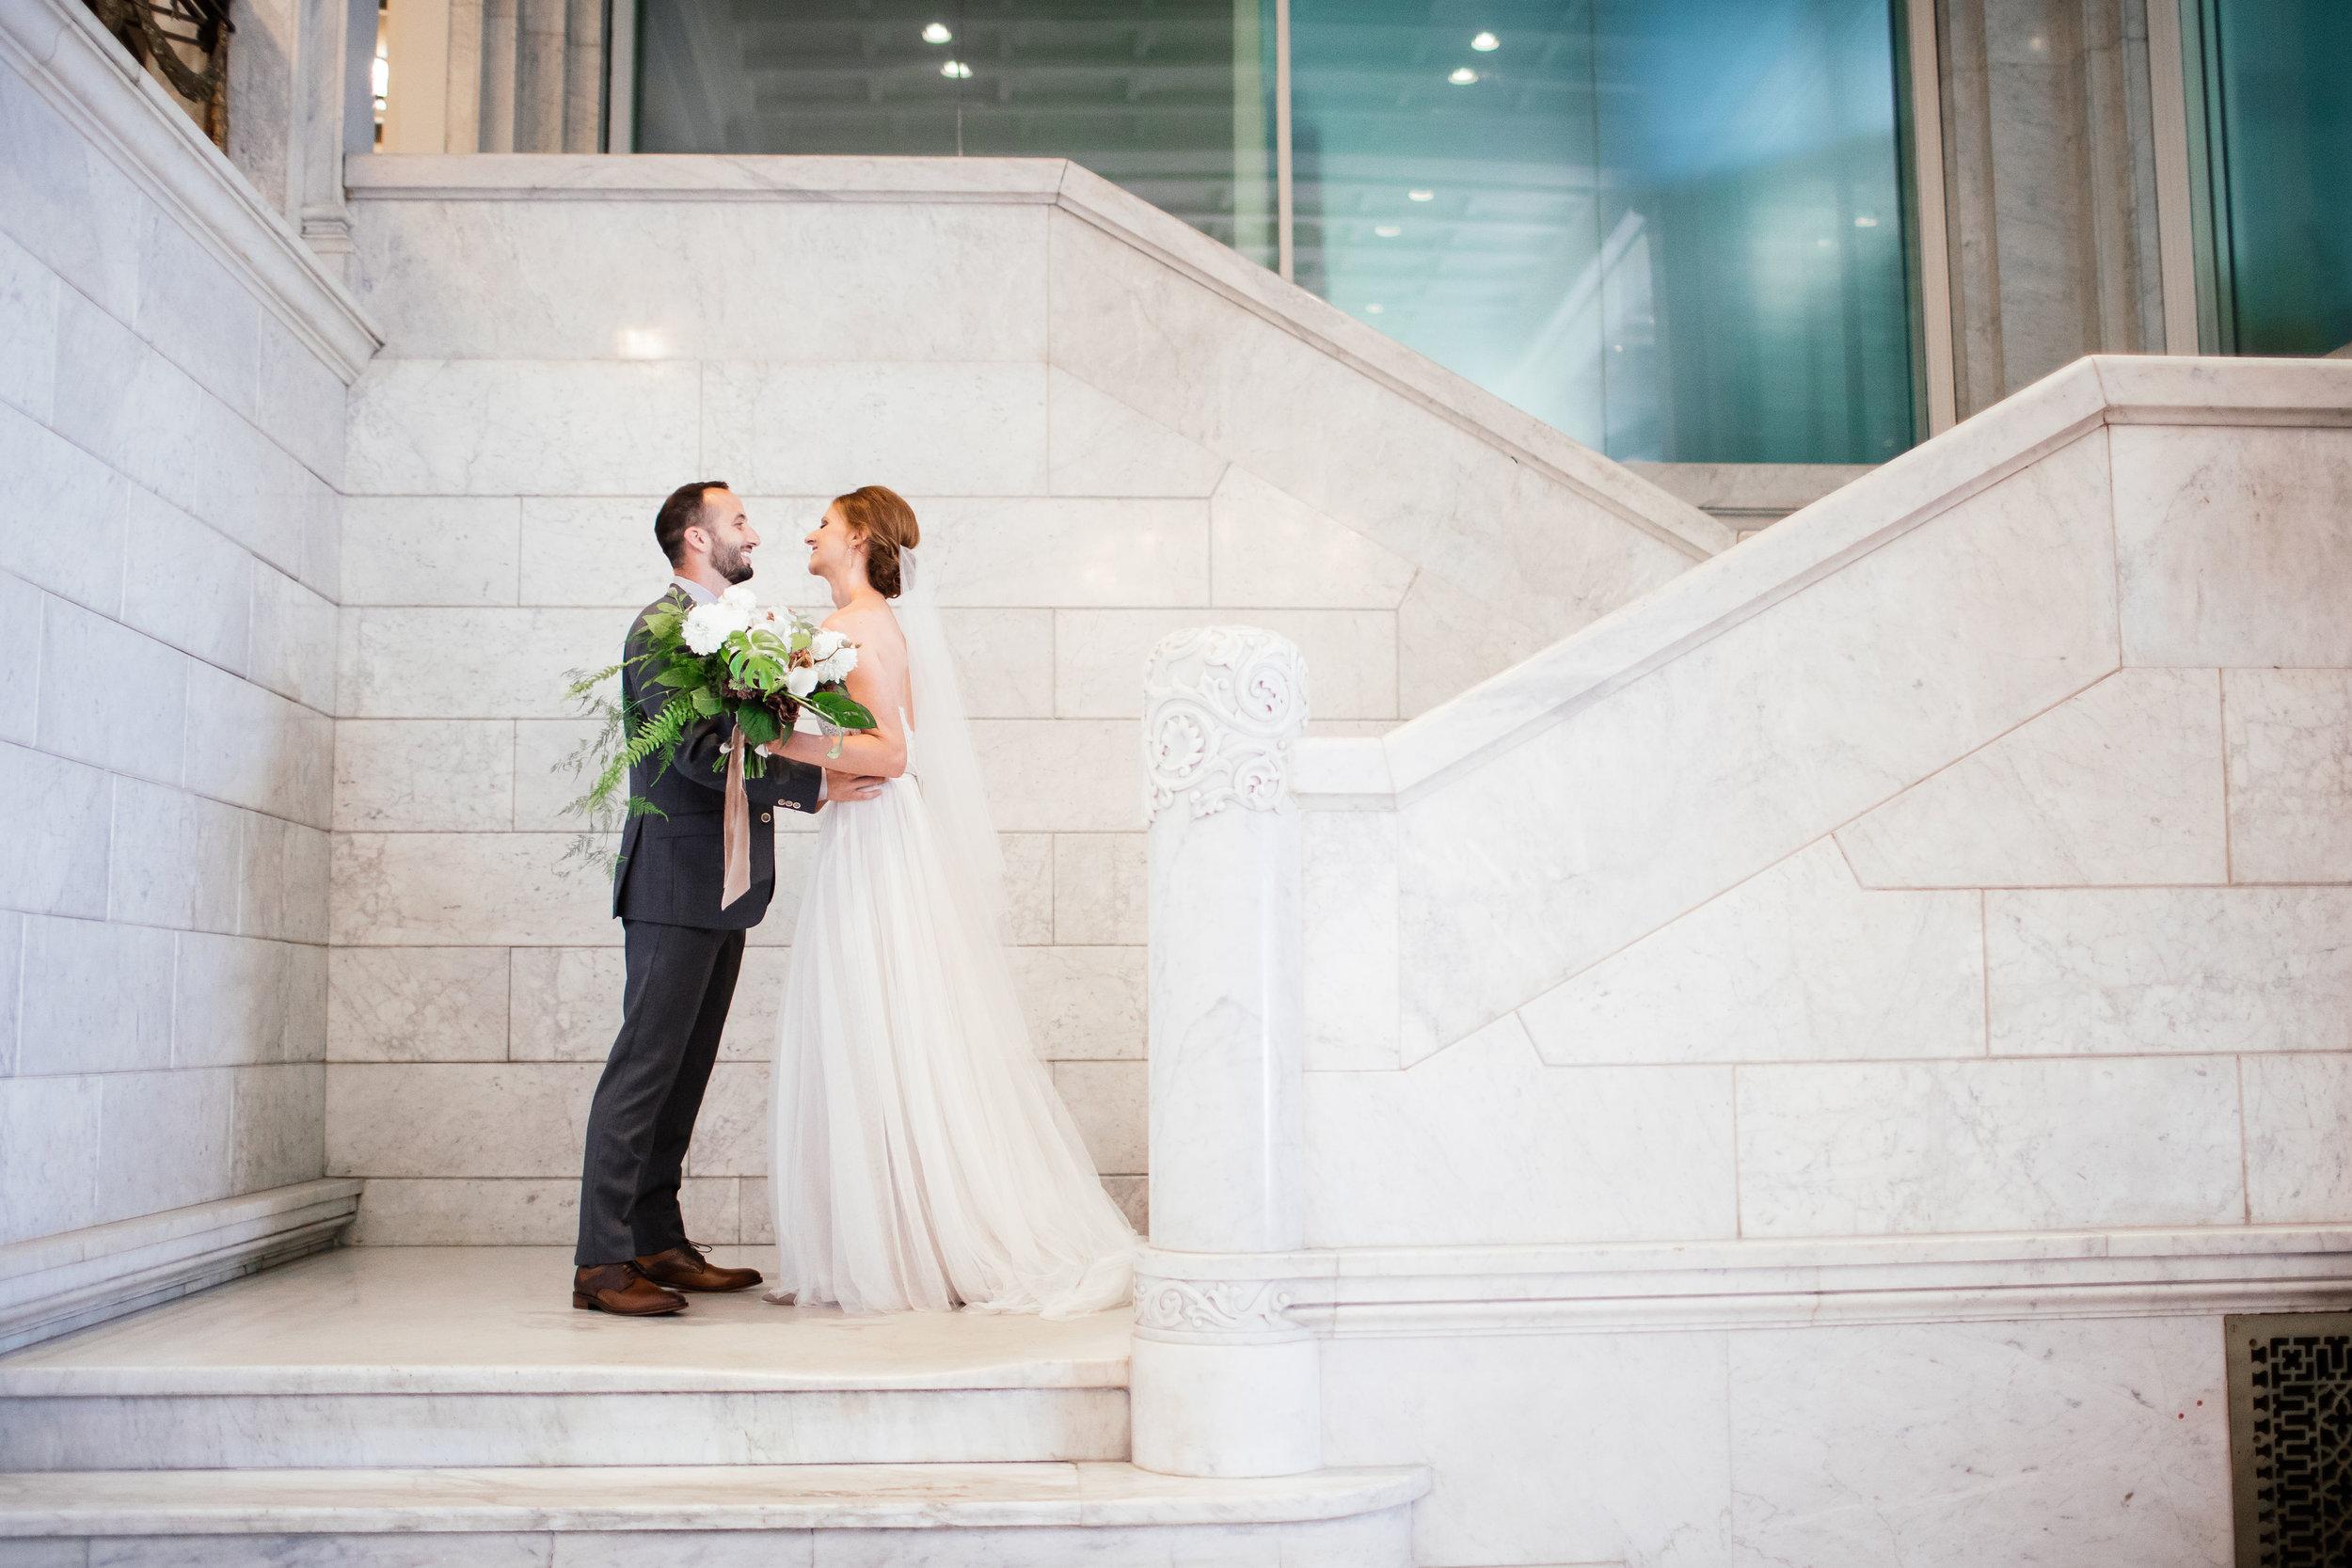 St Paul wedding videographer